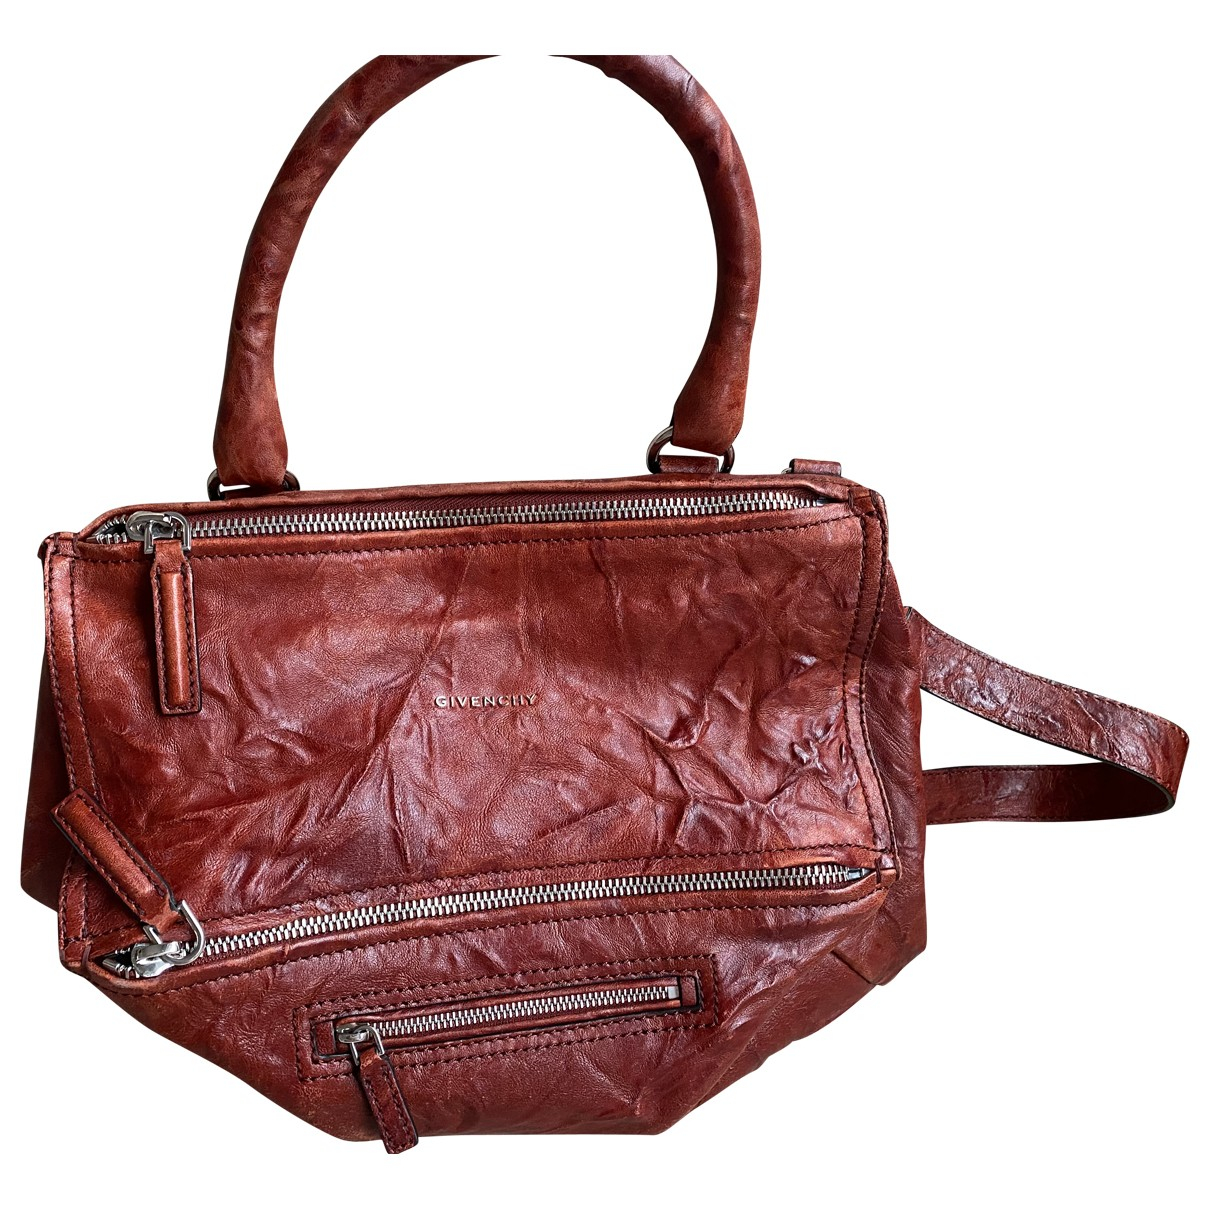 Givenchy Pandora Handtasche in  Bordeauxrot Leder